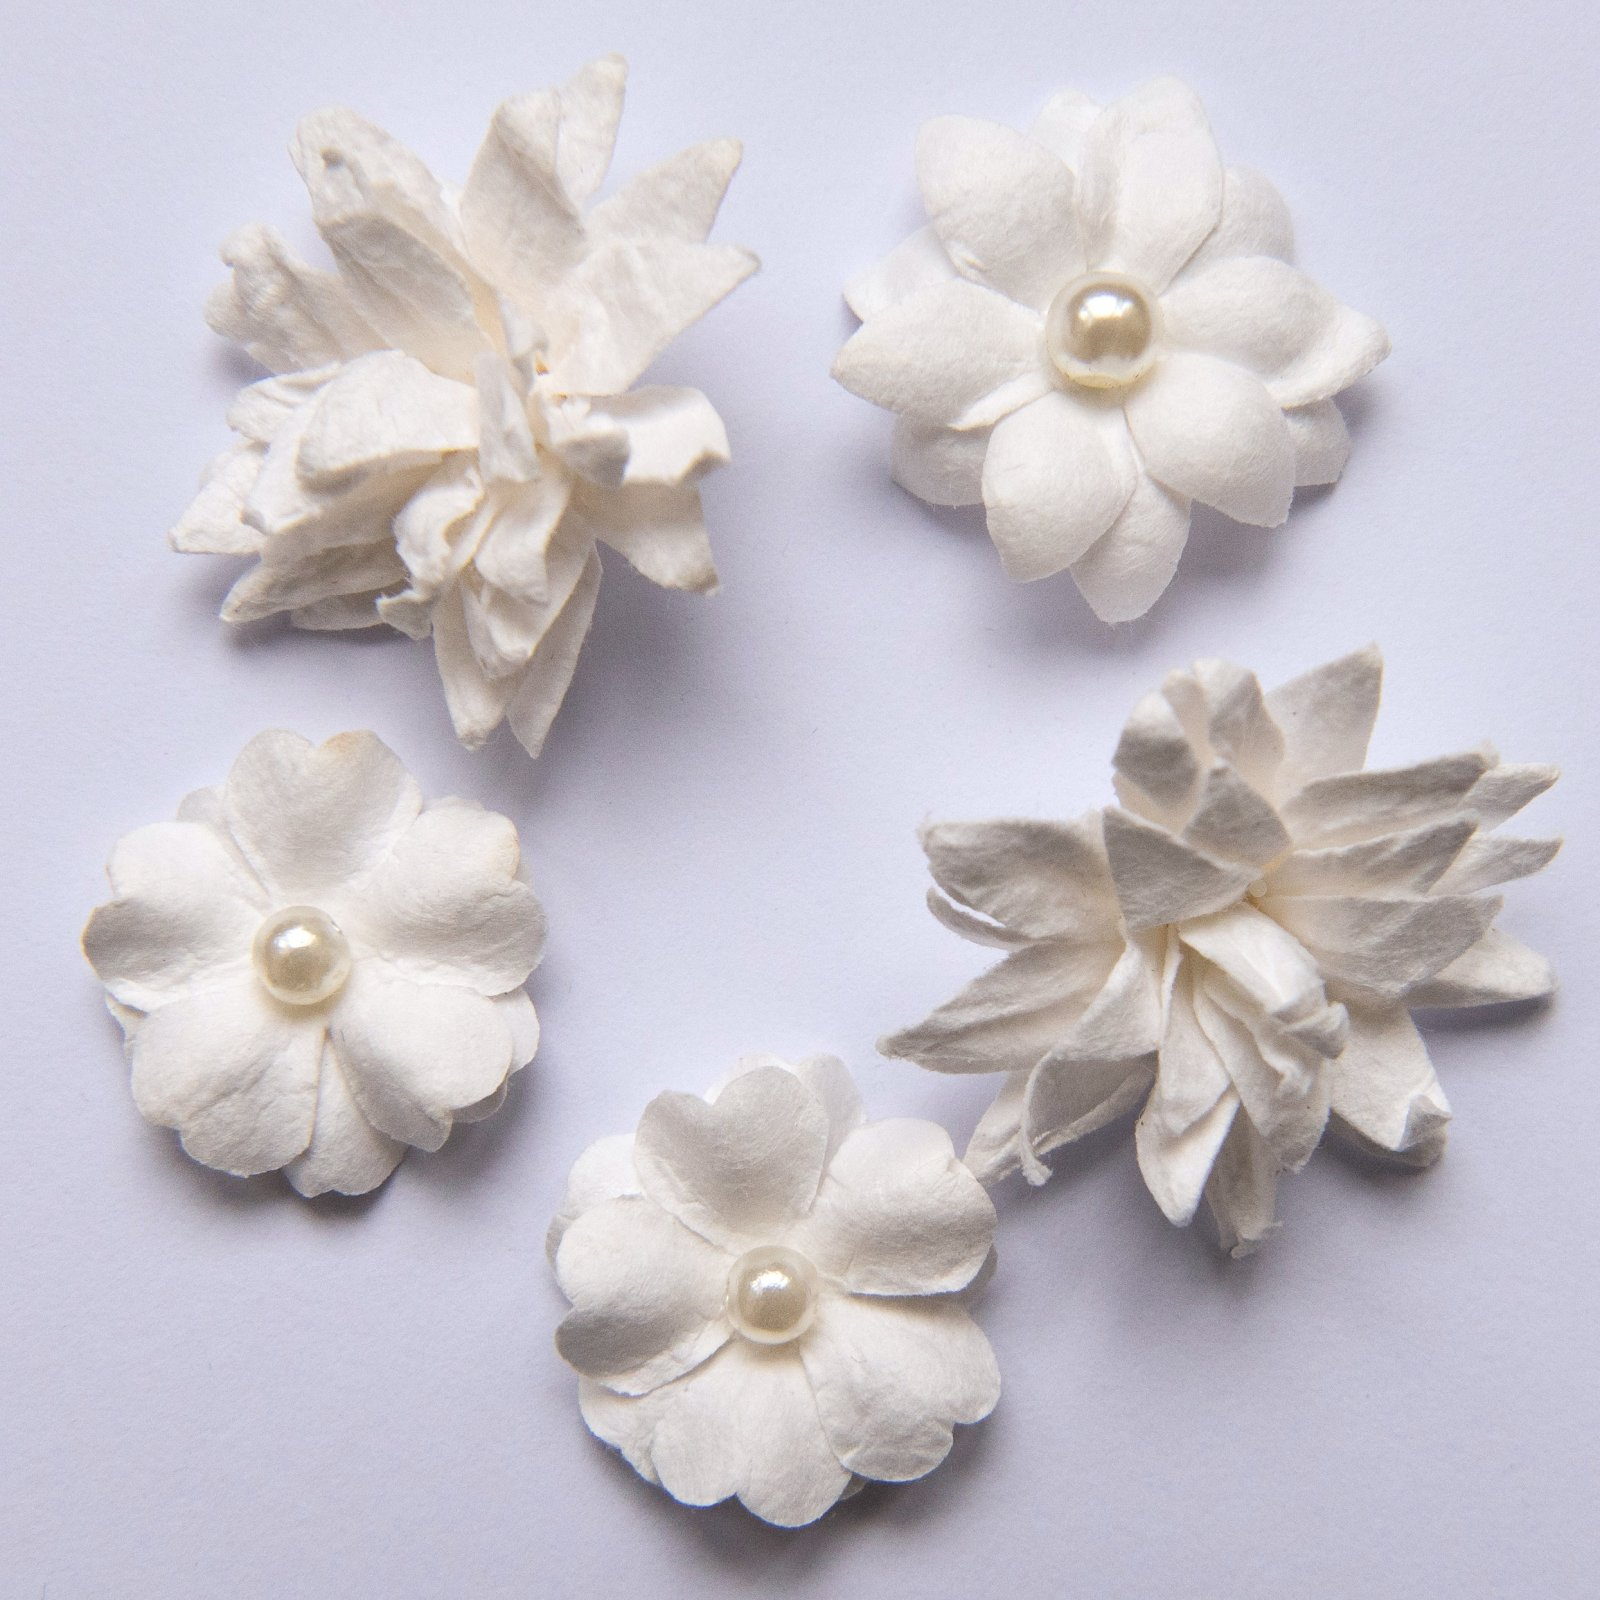 Flower mini series cloud